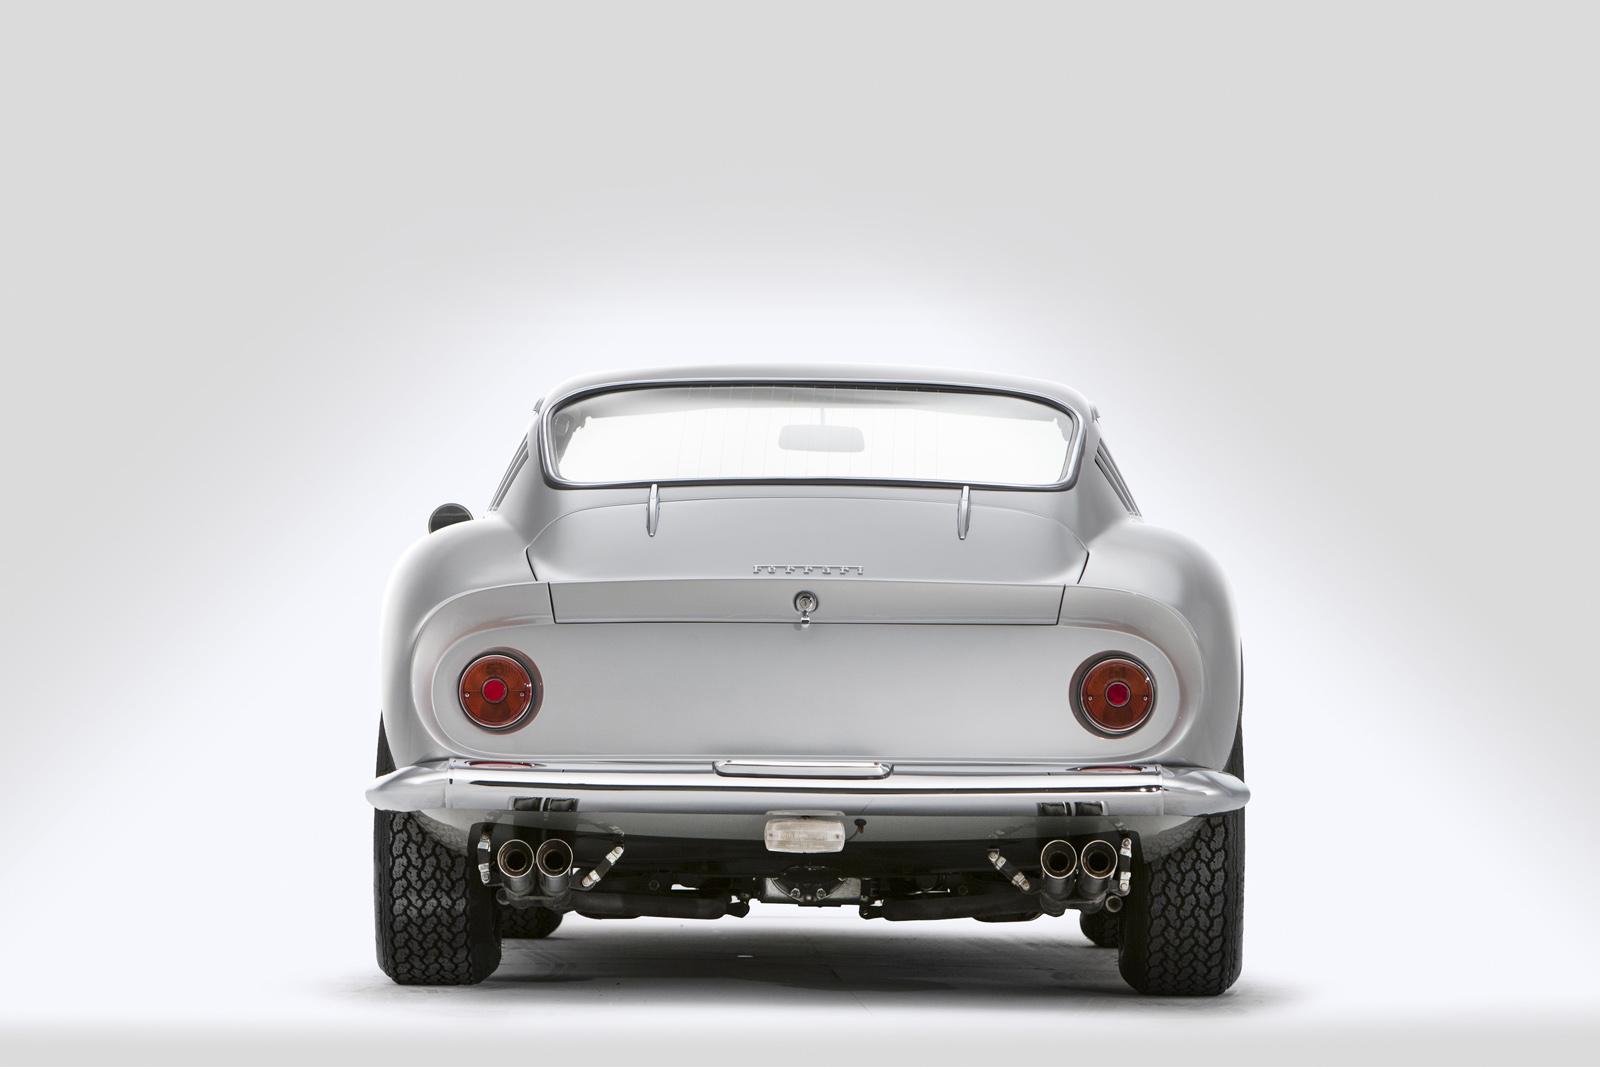 1964 Porsche 904 Gts Set To Headline Bonhams Scottsdale